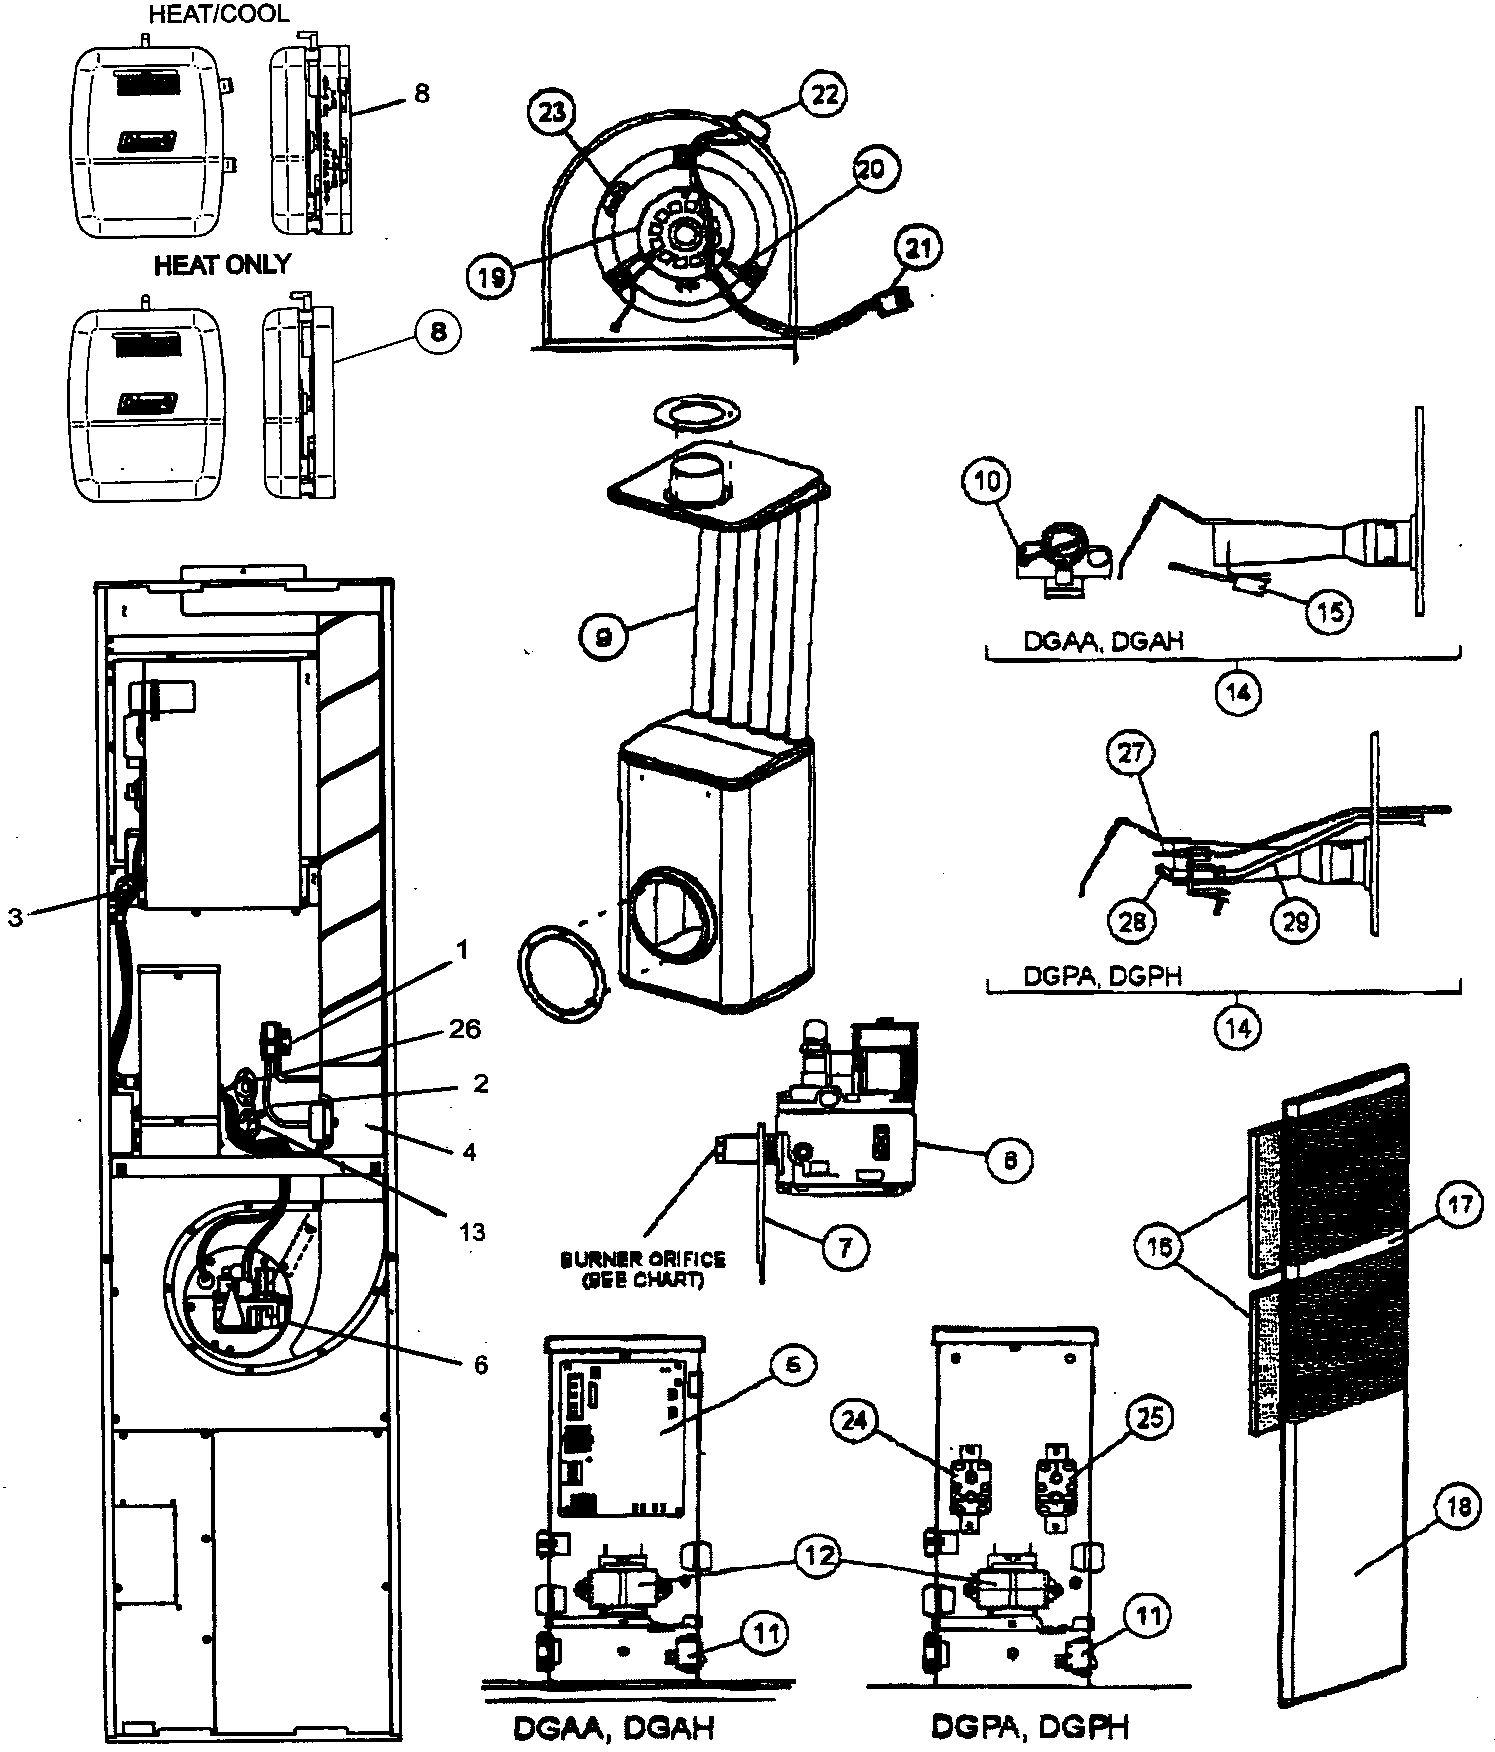 coleman furnace schematics wiring diagram mega coleman furnace schematics [ 1495 x 1752 Pixel ]